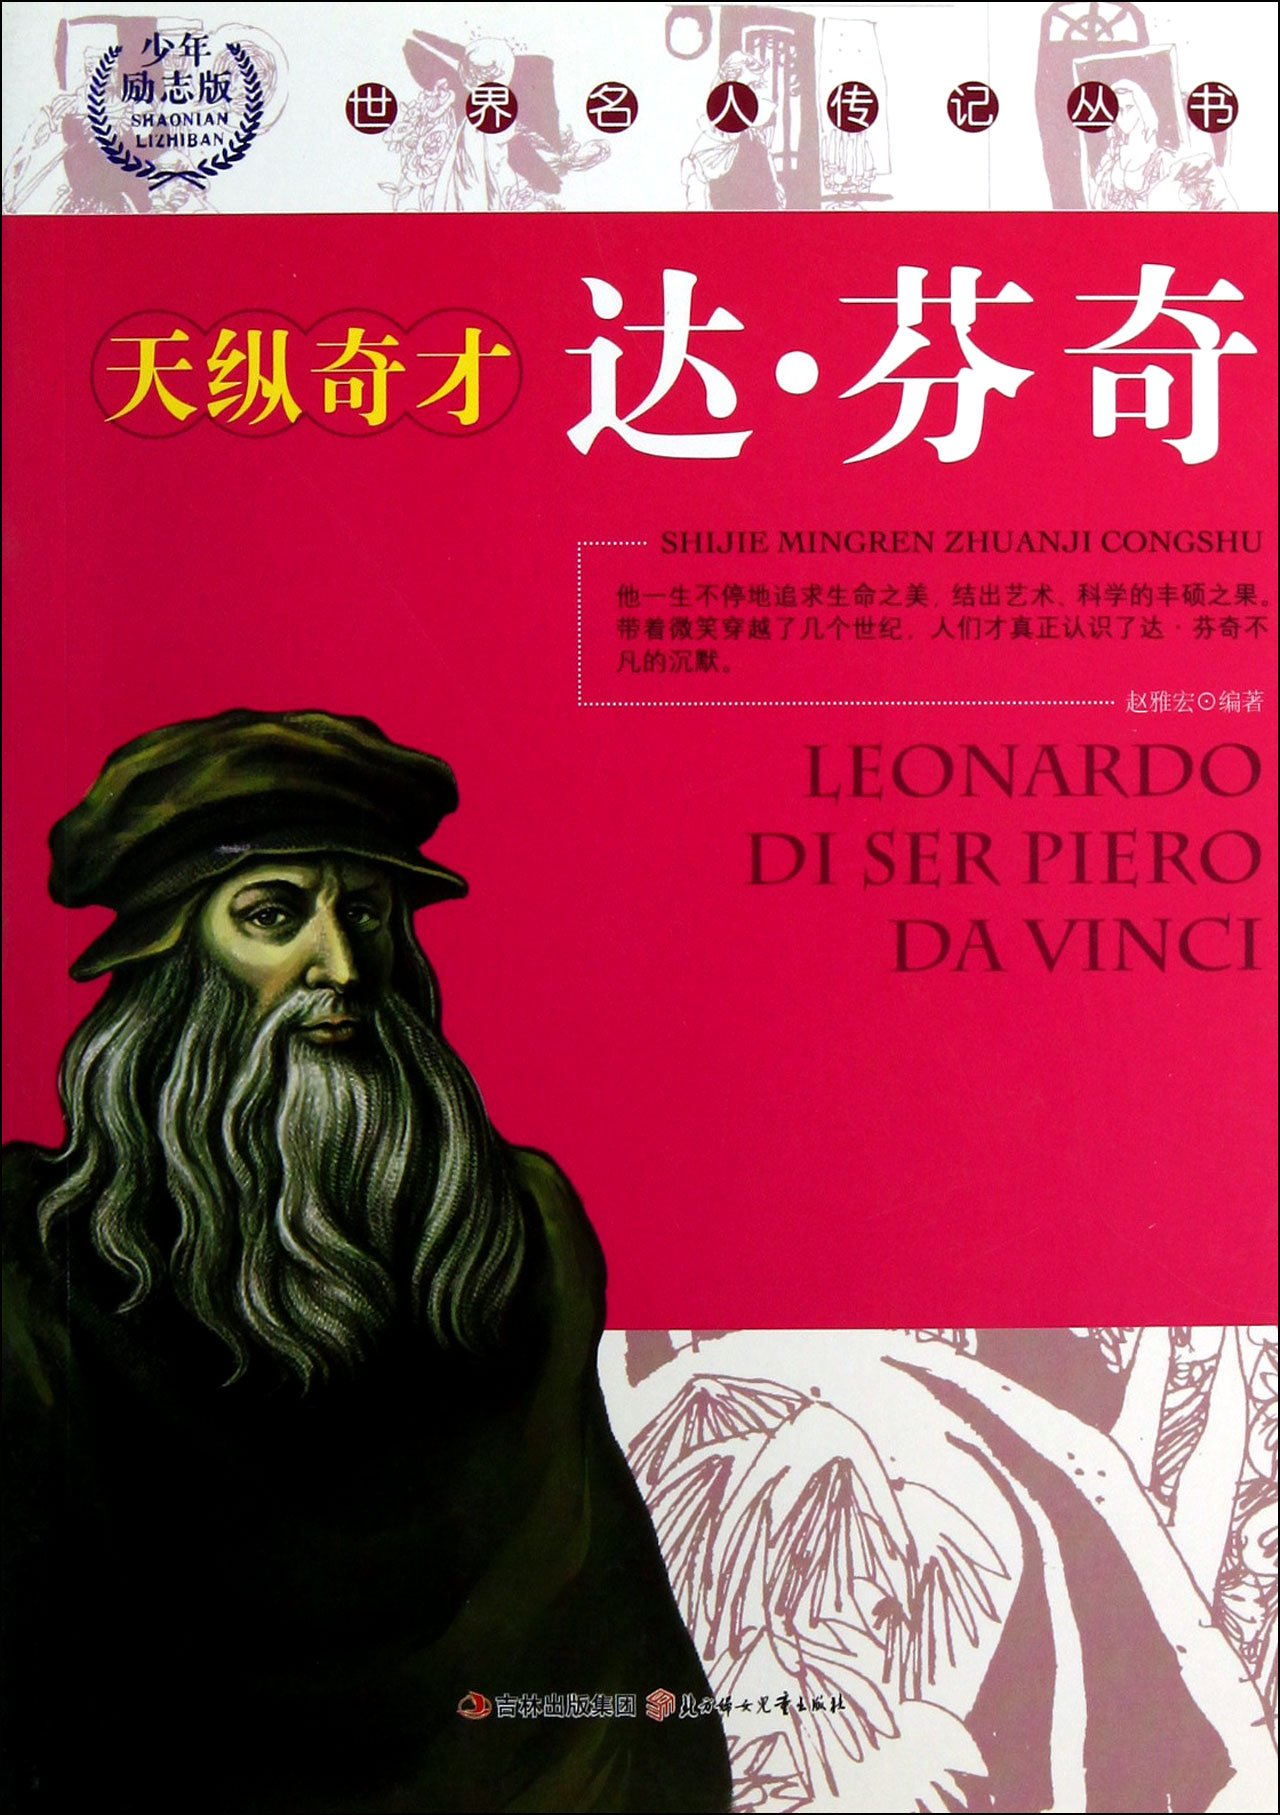 tales of leonardo da vincichinese edition